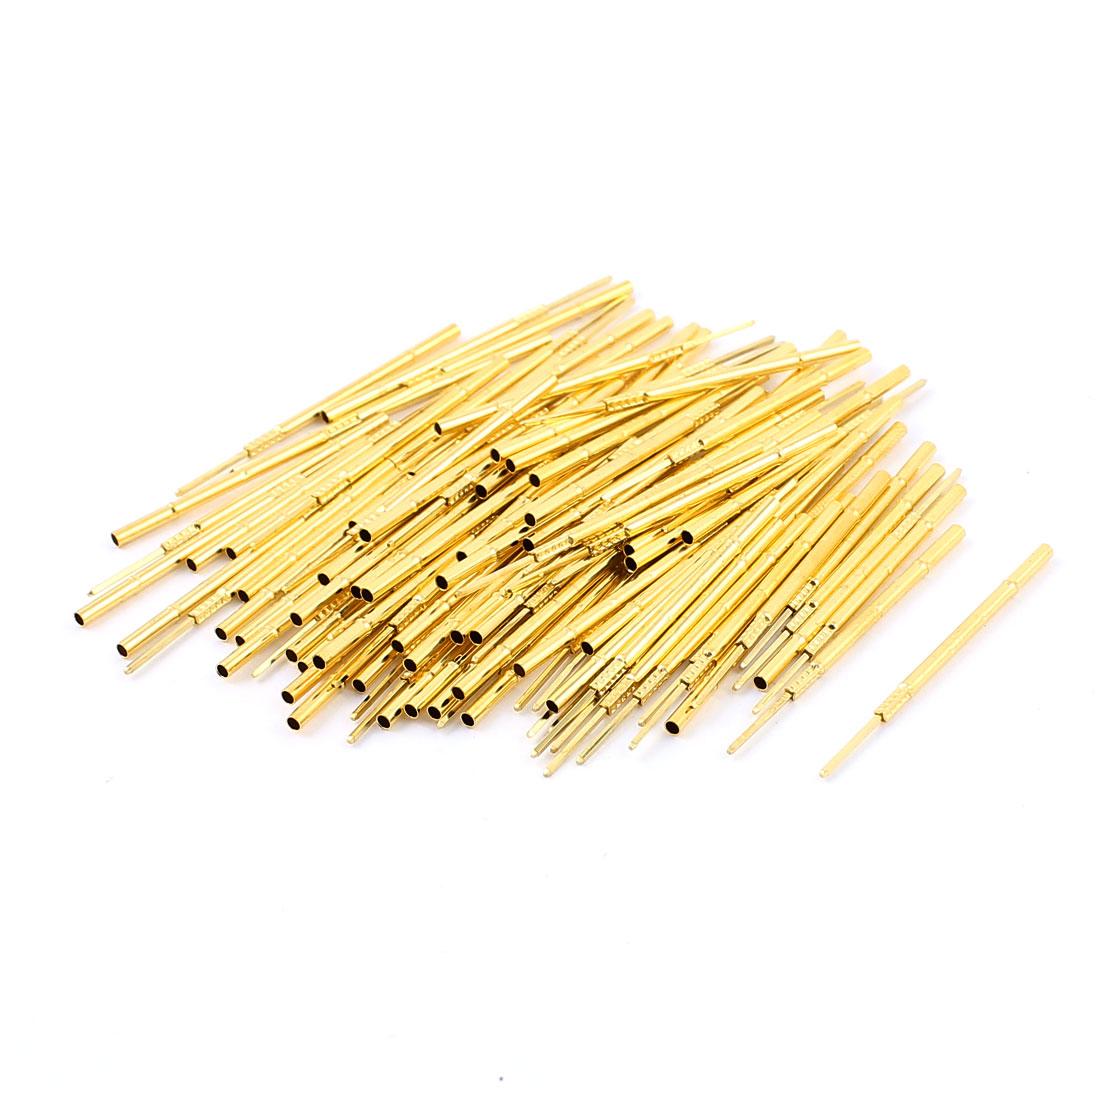 P100-4W 40mm Length Metal Test Probe Receptacle Gold Tone 100pcs